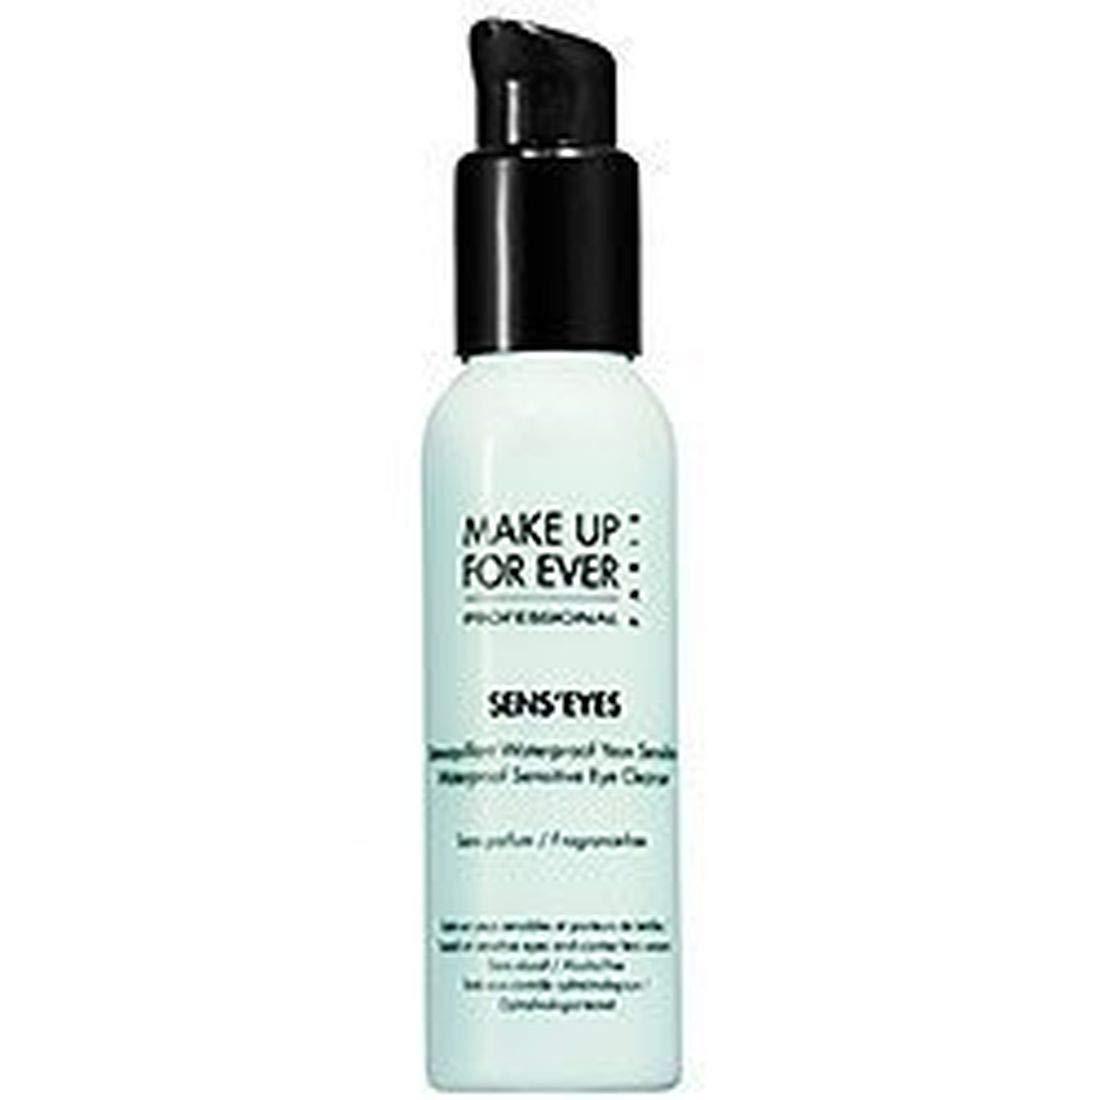 Make up for Ever Sens'eyes - Waterproof Sensitive Eye Cleanser 3.38 Fl. Oz -gel makeup remover for eyes and lips.